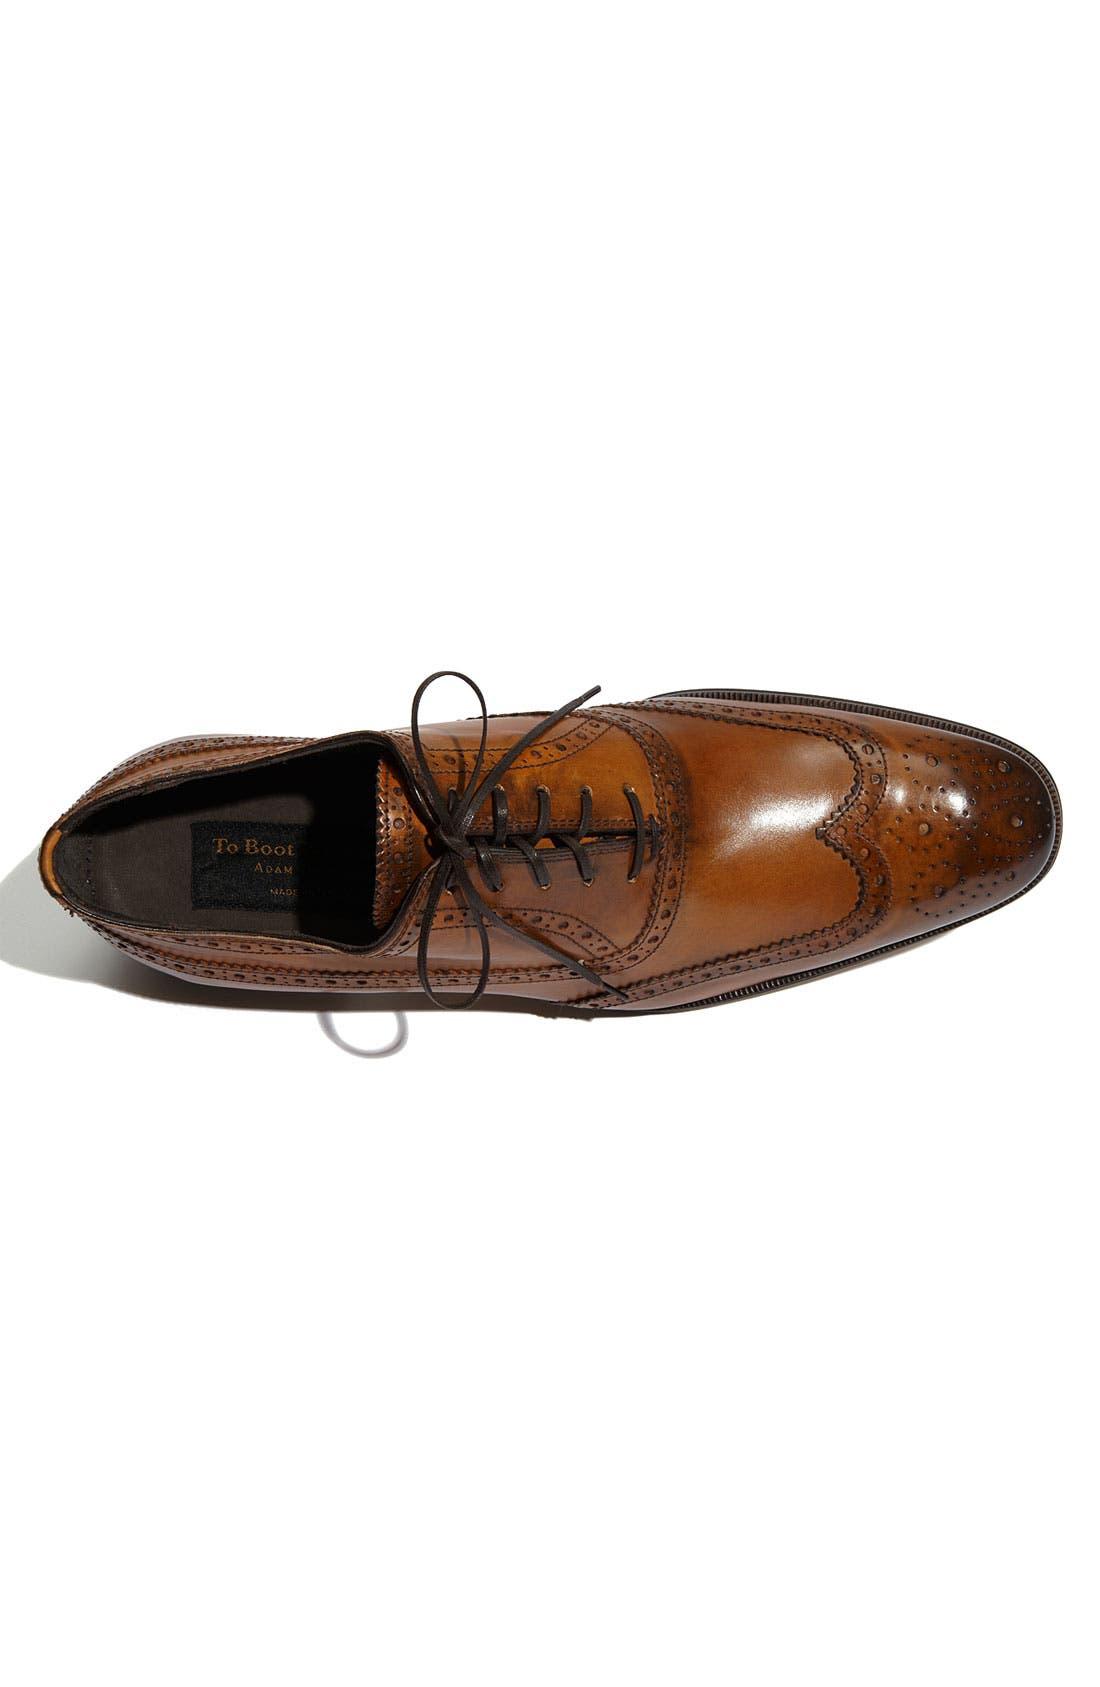 Alternate Image 3  - To Boot New York 'Windsor' Wingtip Oxford (Men)